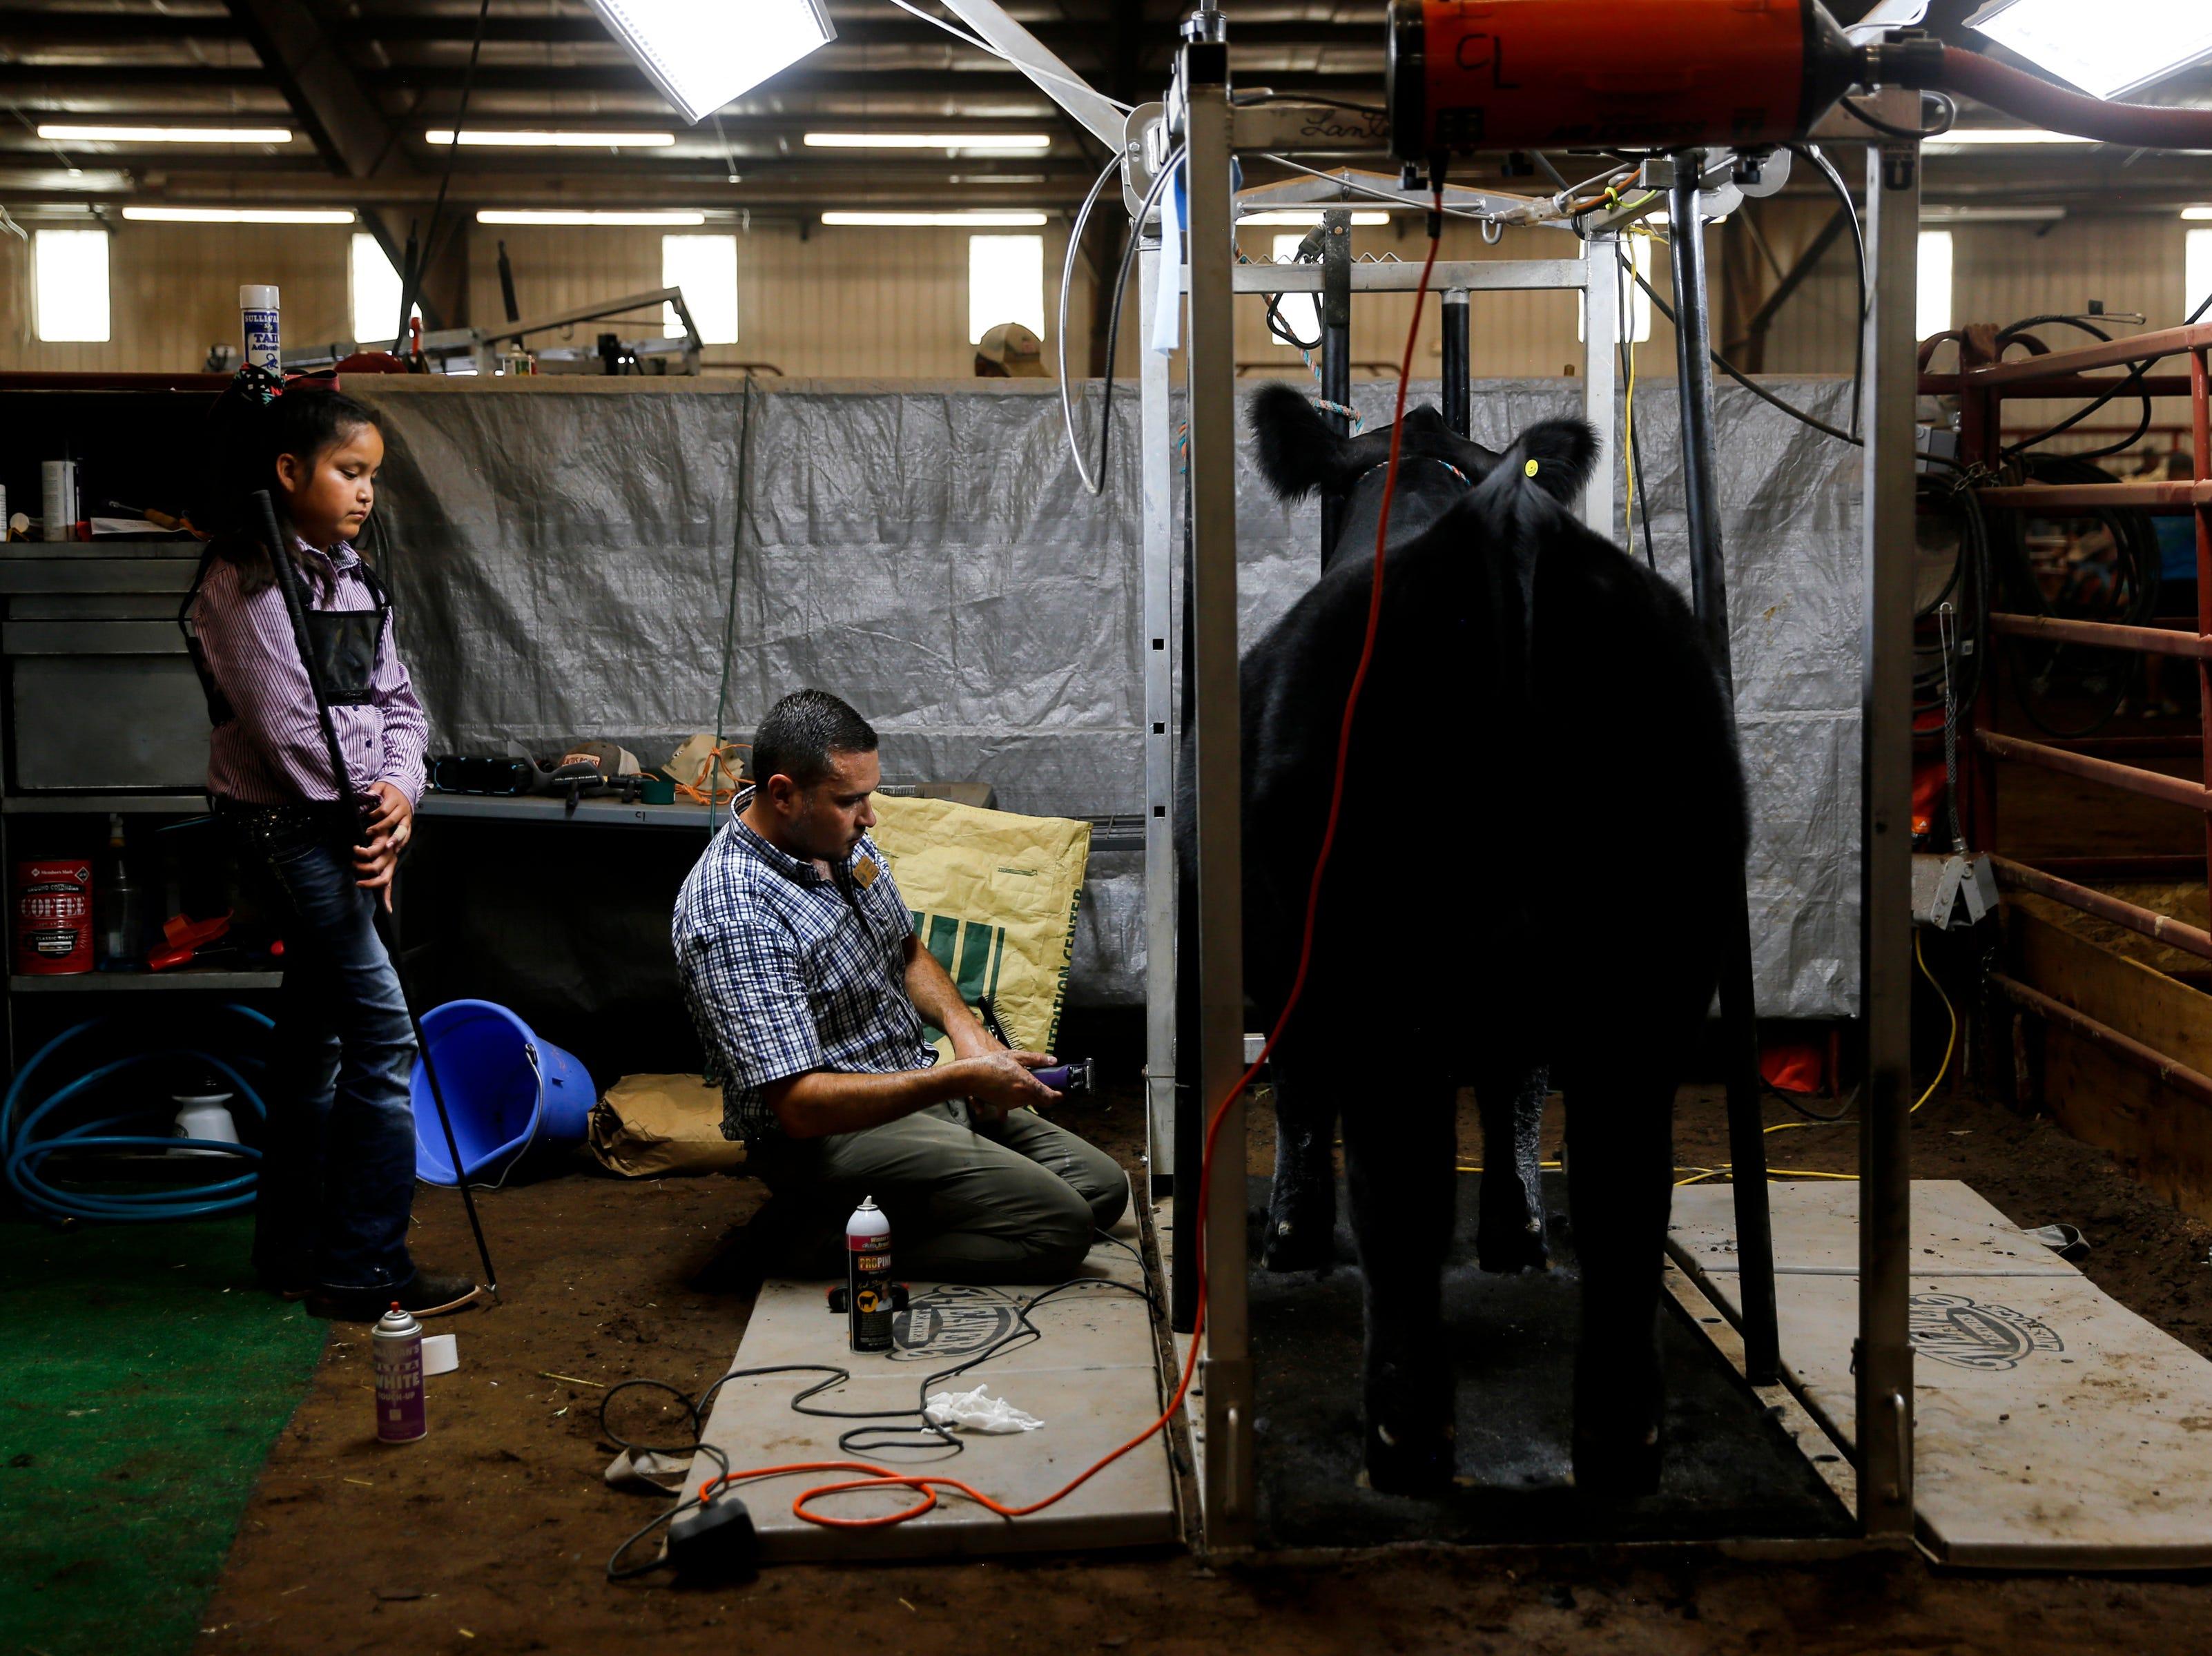 Tatum Latana, left, watches Davin Jacquez work on her steer Major, Thursday, Aug. 16, 2018 during the annual beef show at the San Juan County Fair at McGee Park in Farmington.